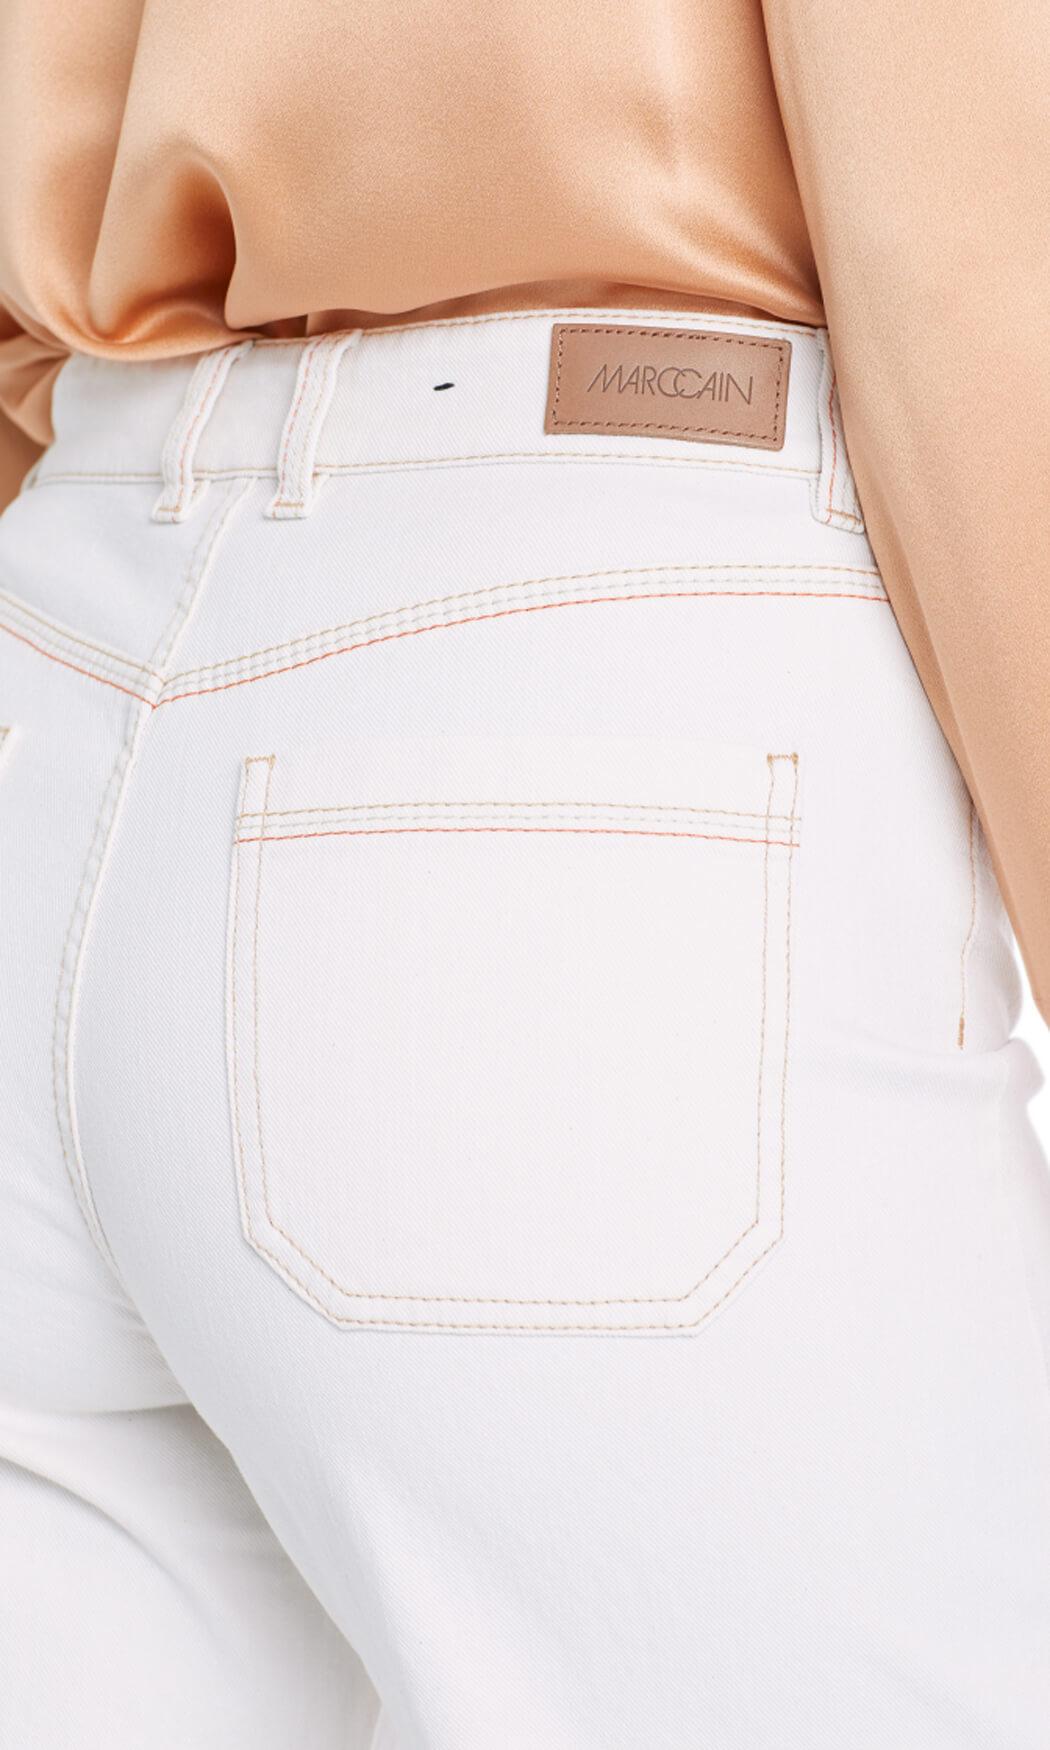 Marccain Dames Wijde jeans Ecru